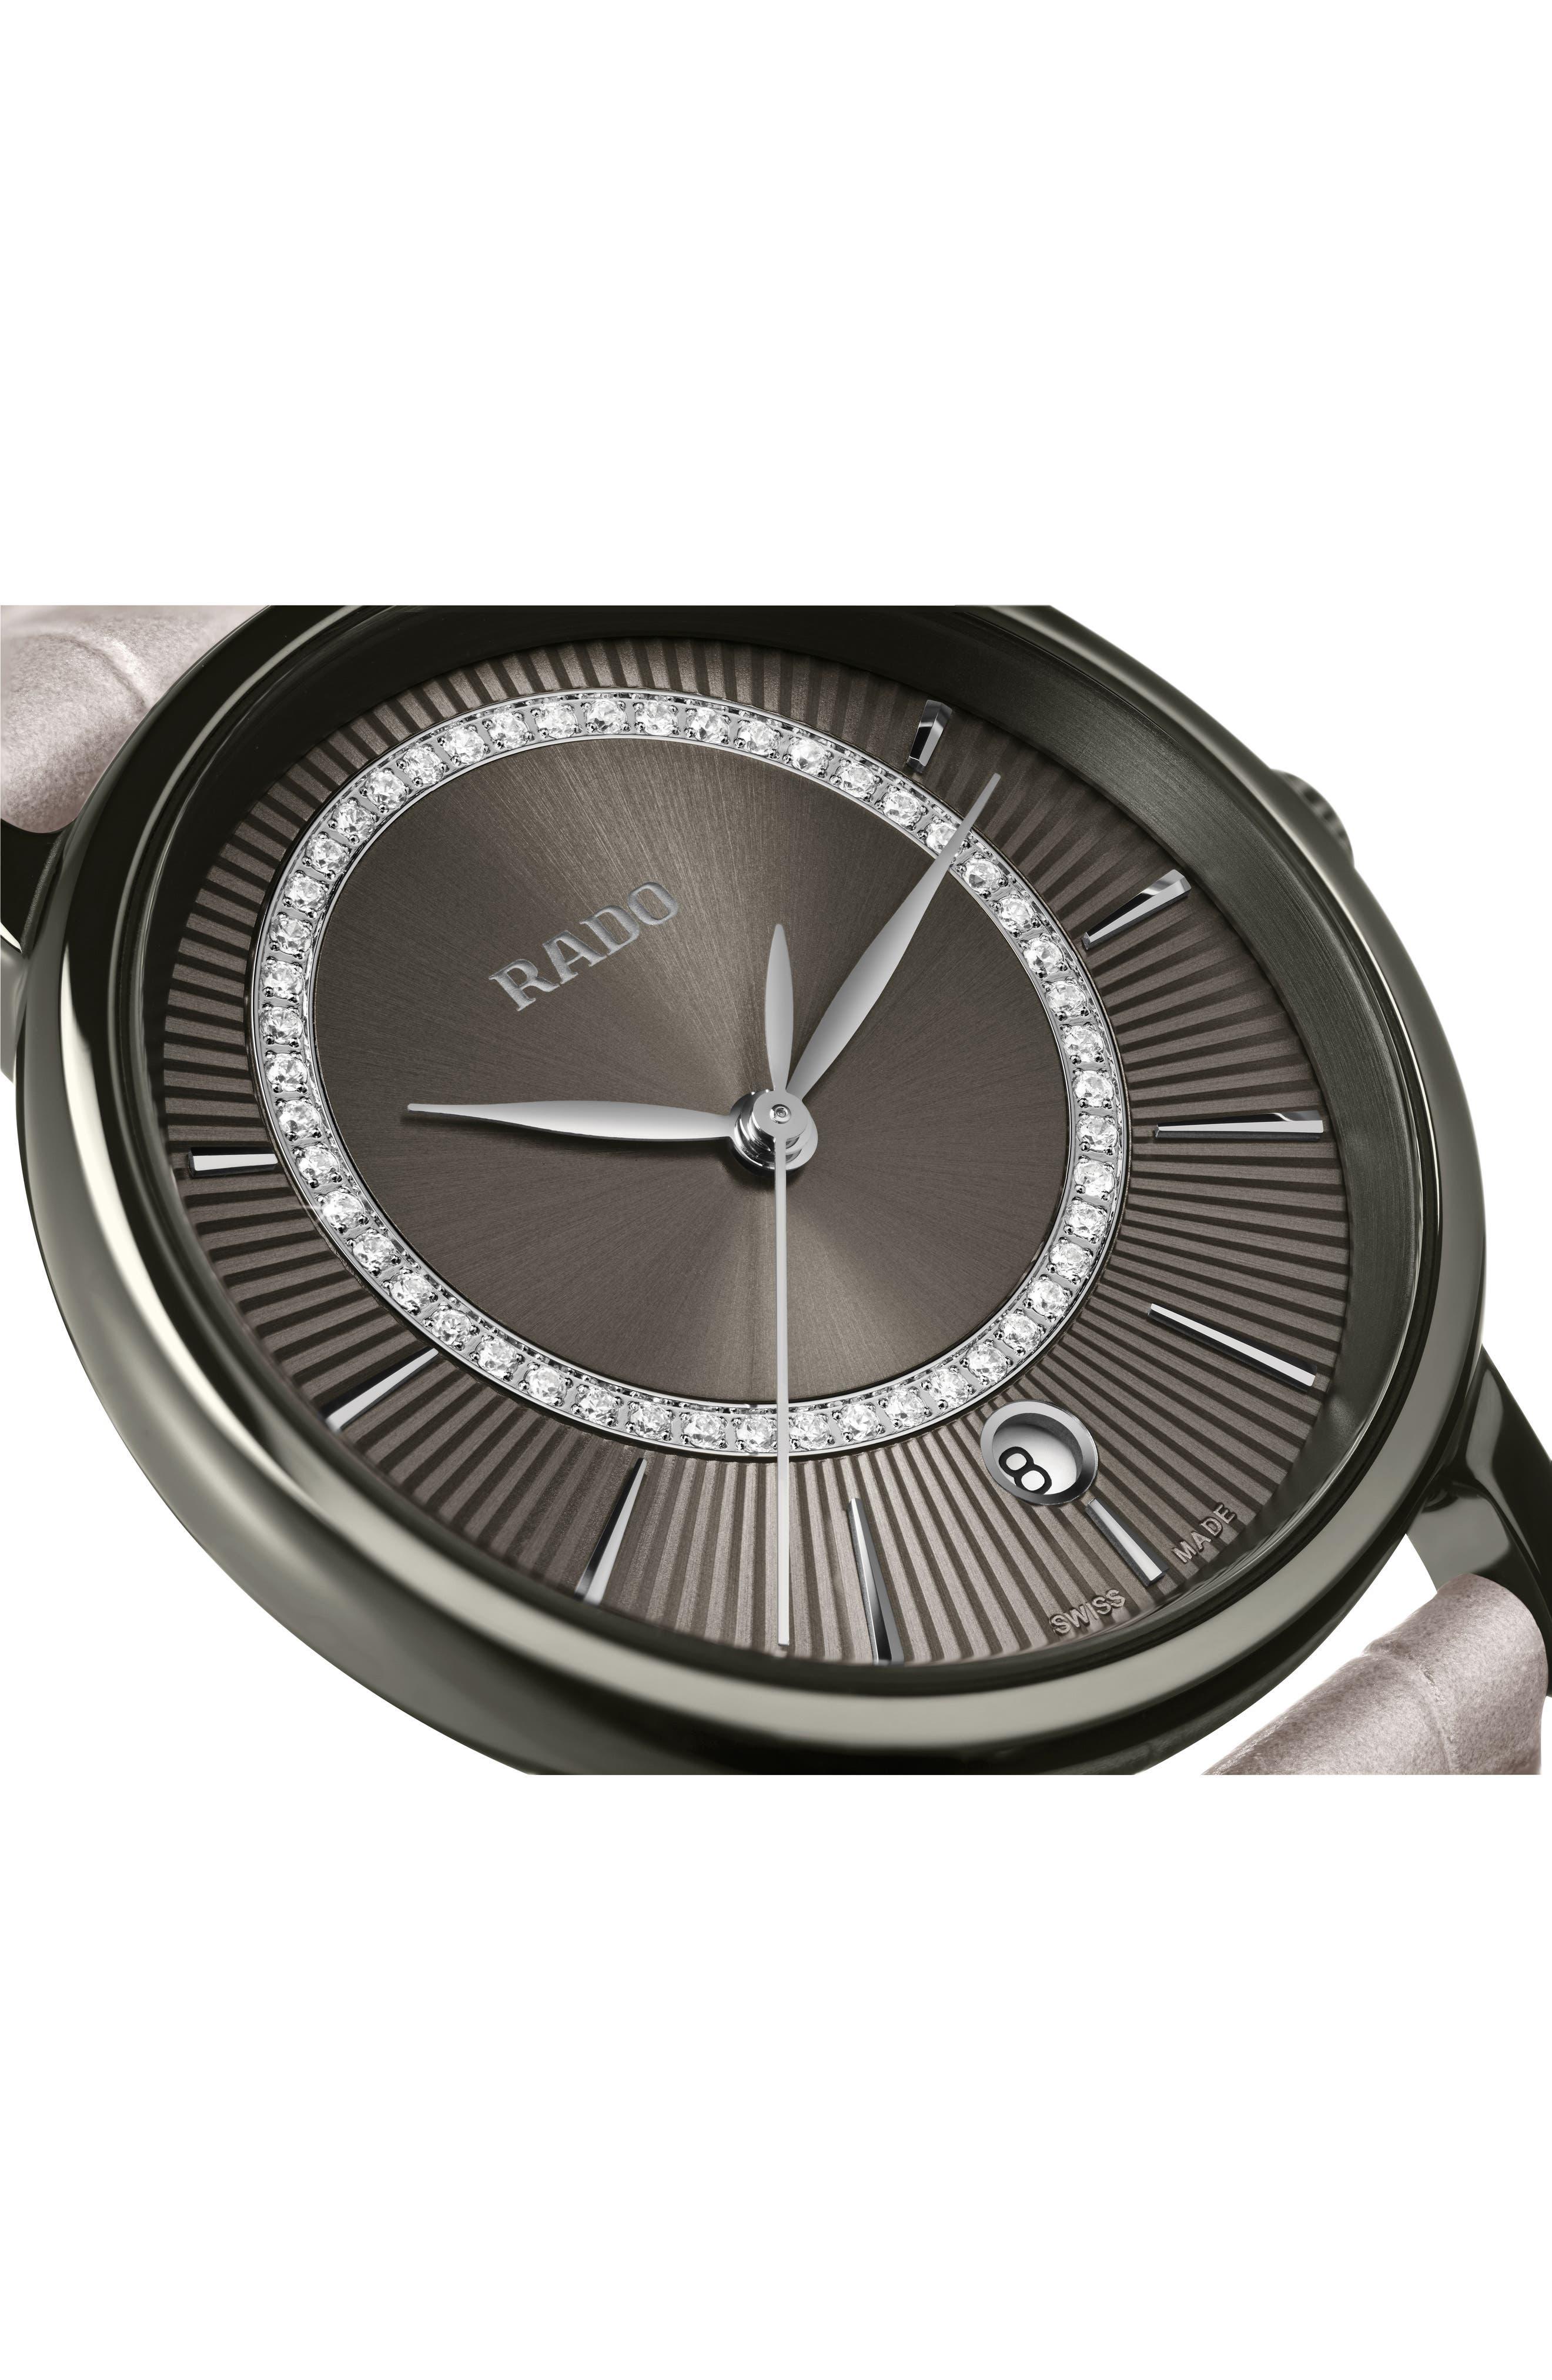 DiaMaster Diamond Leather Strap Watch, 33mm,                             Alternate thumbnail 2, color,                             GREY/ TITANIUM